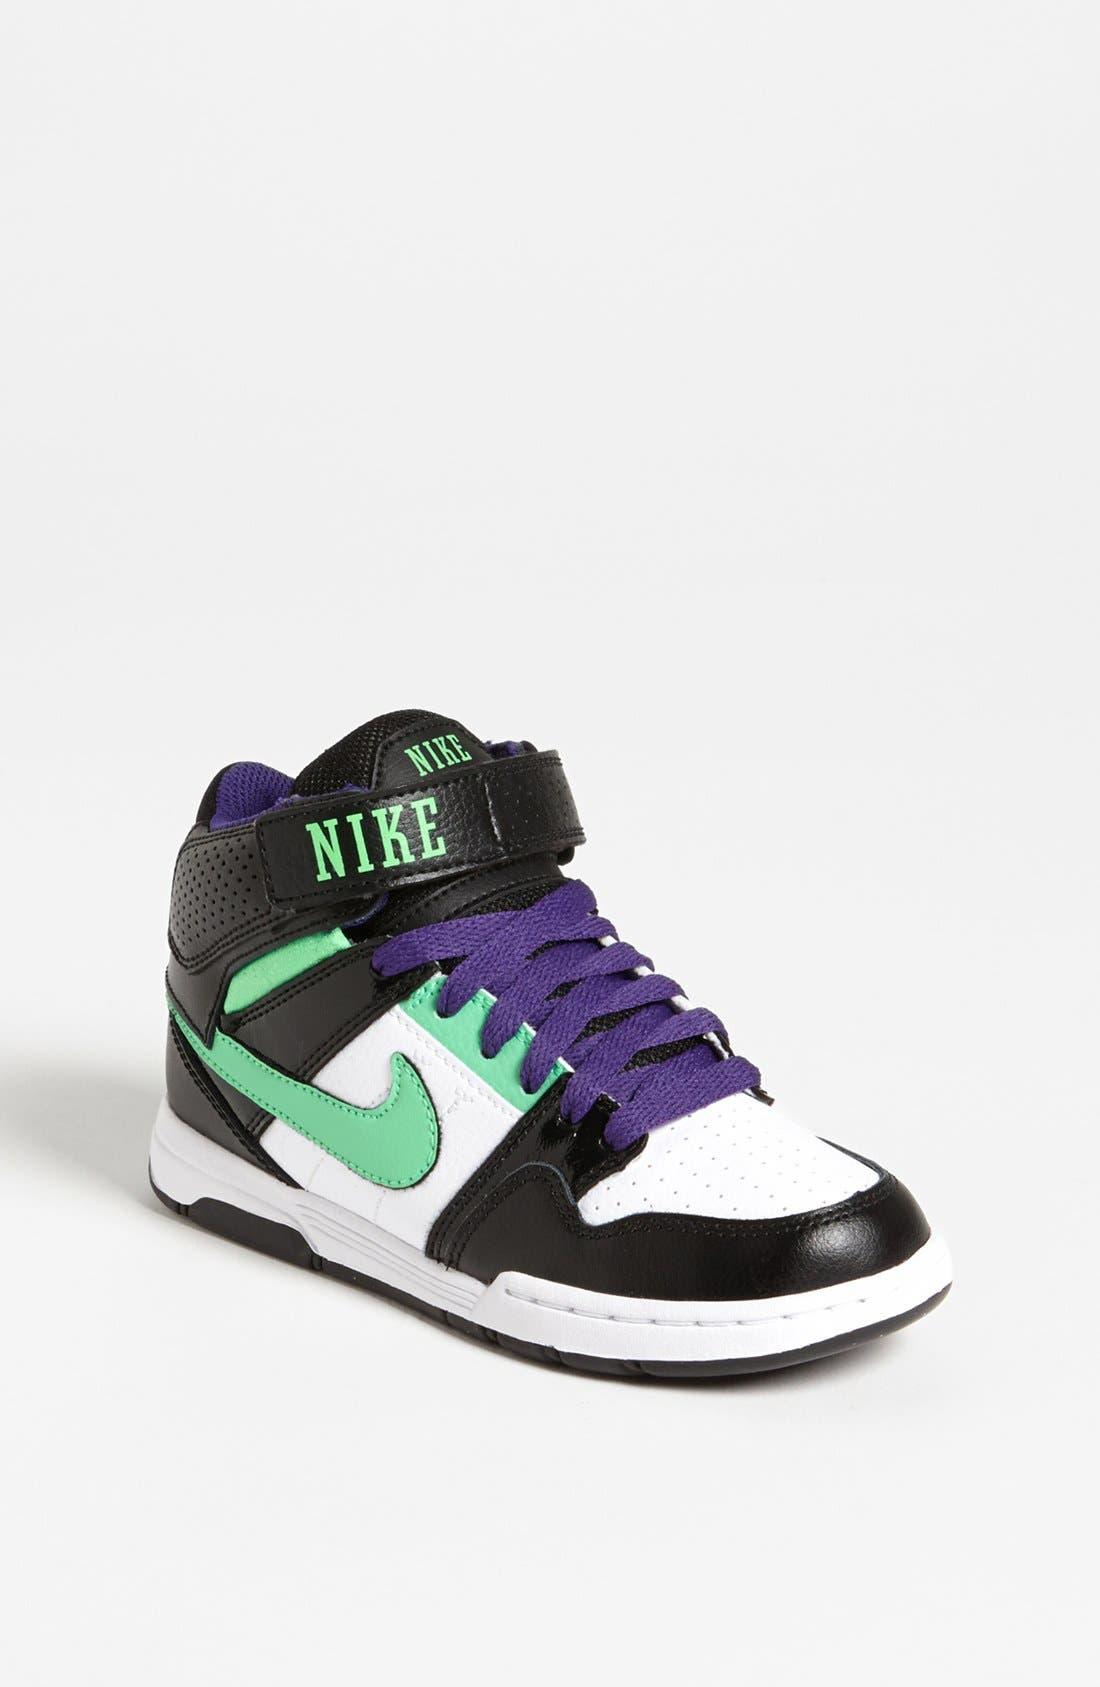 Alternate Image 1 Selected - Nike 6.0 'Mogan Mid' Sneaker (Toddler, Little Kid & Big Kid)